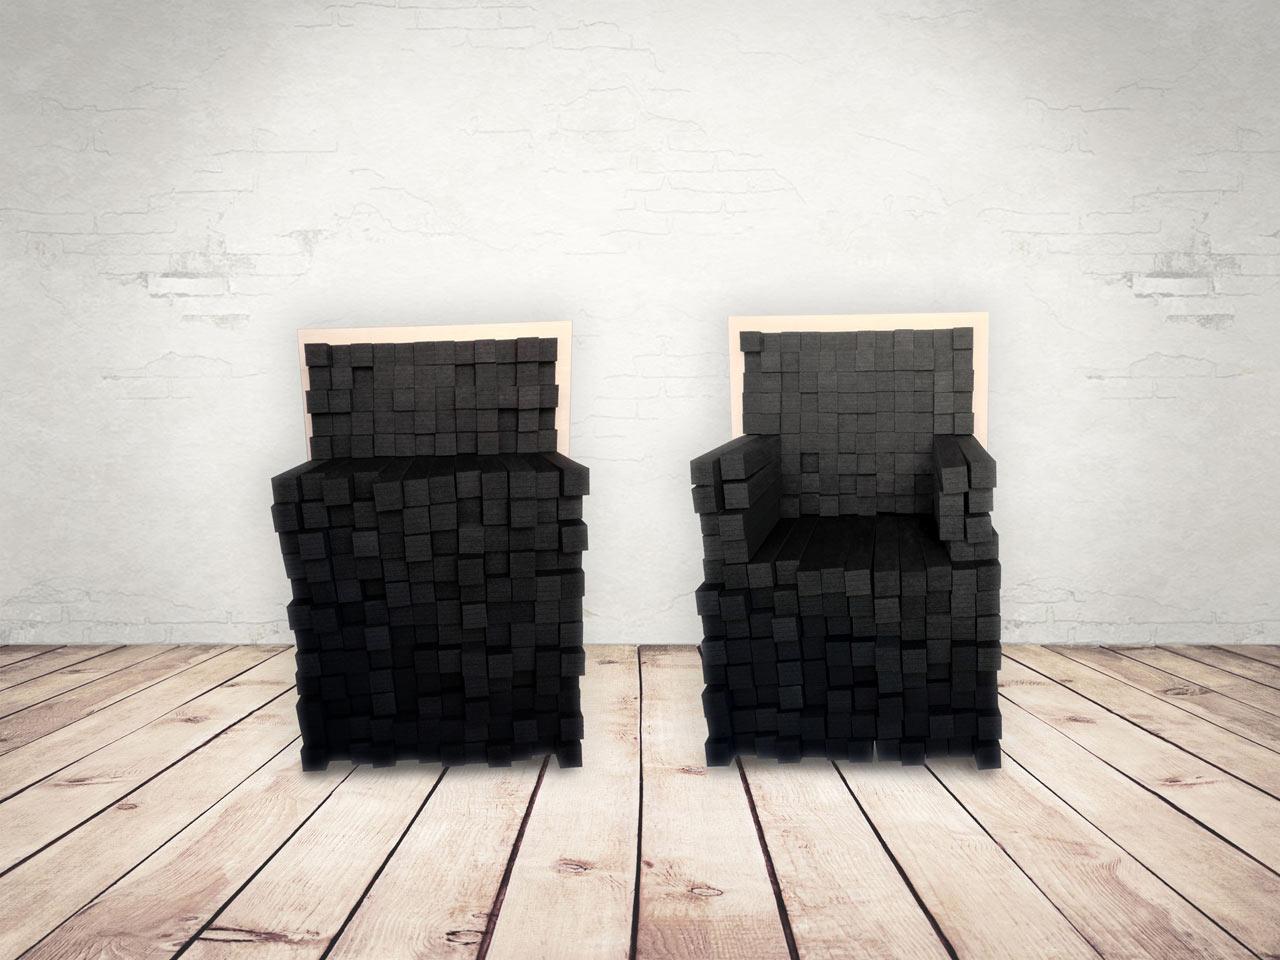 Keren_Shiker-Sink_In-Adjustable-Seating-hisheji (2)